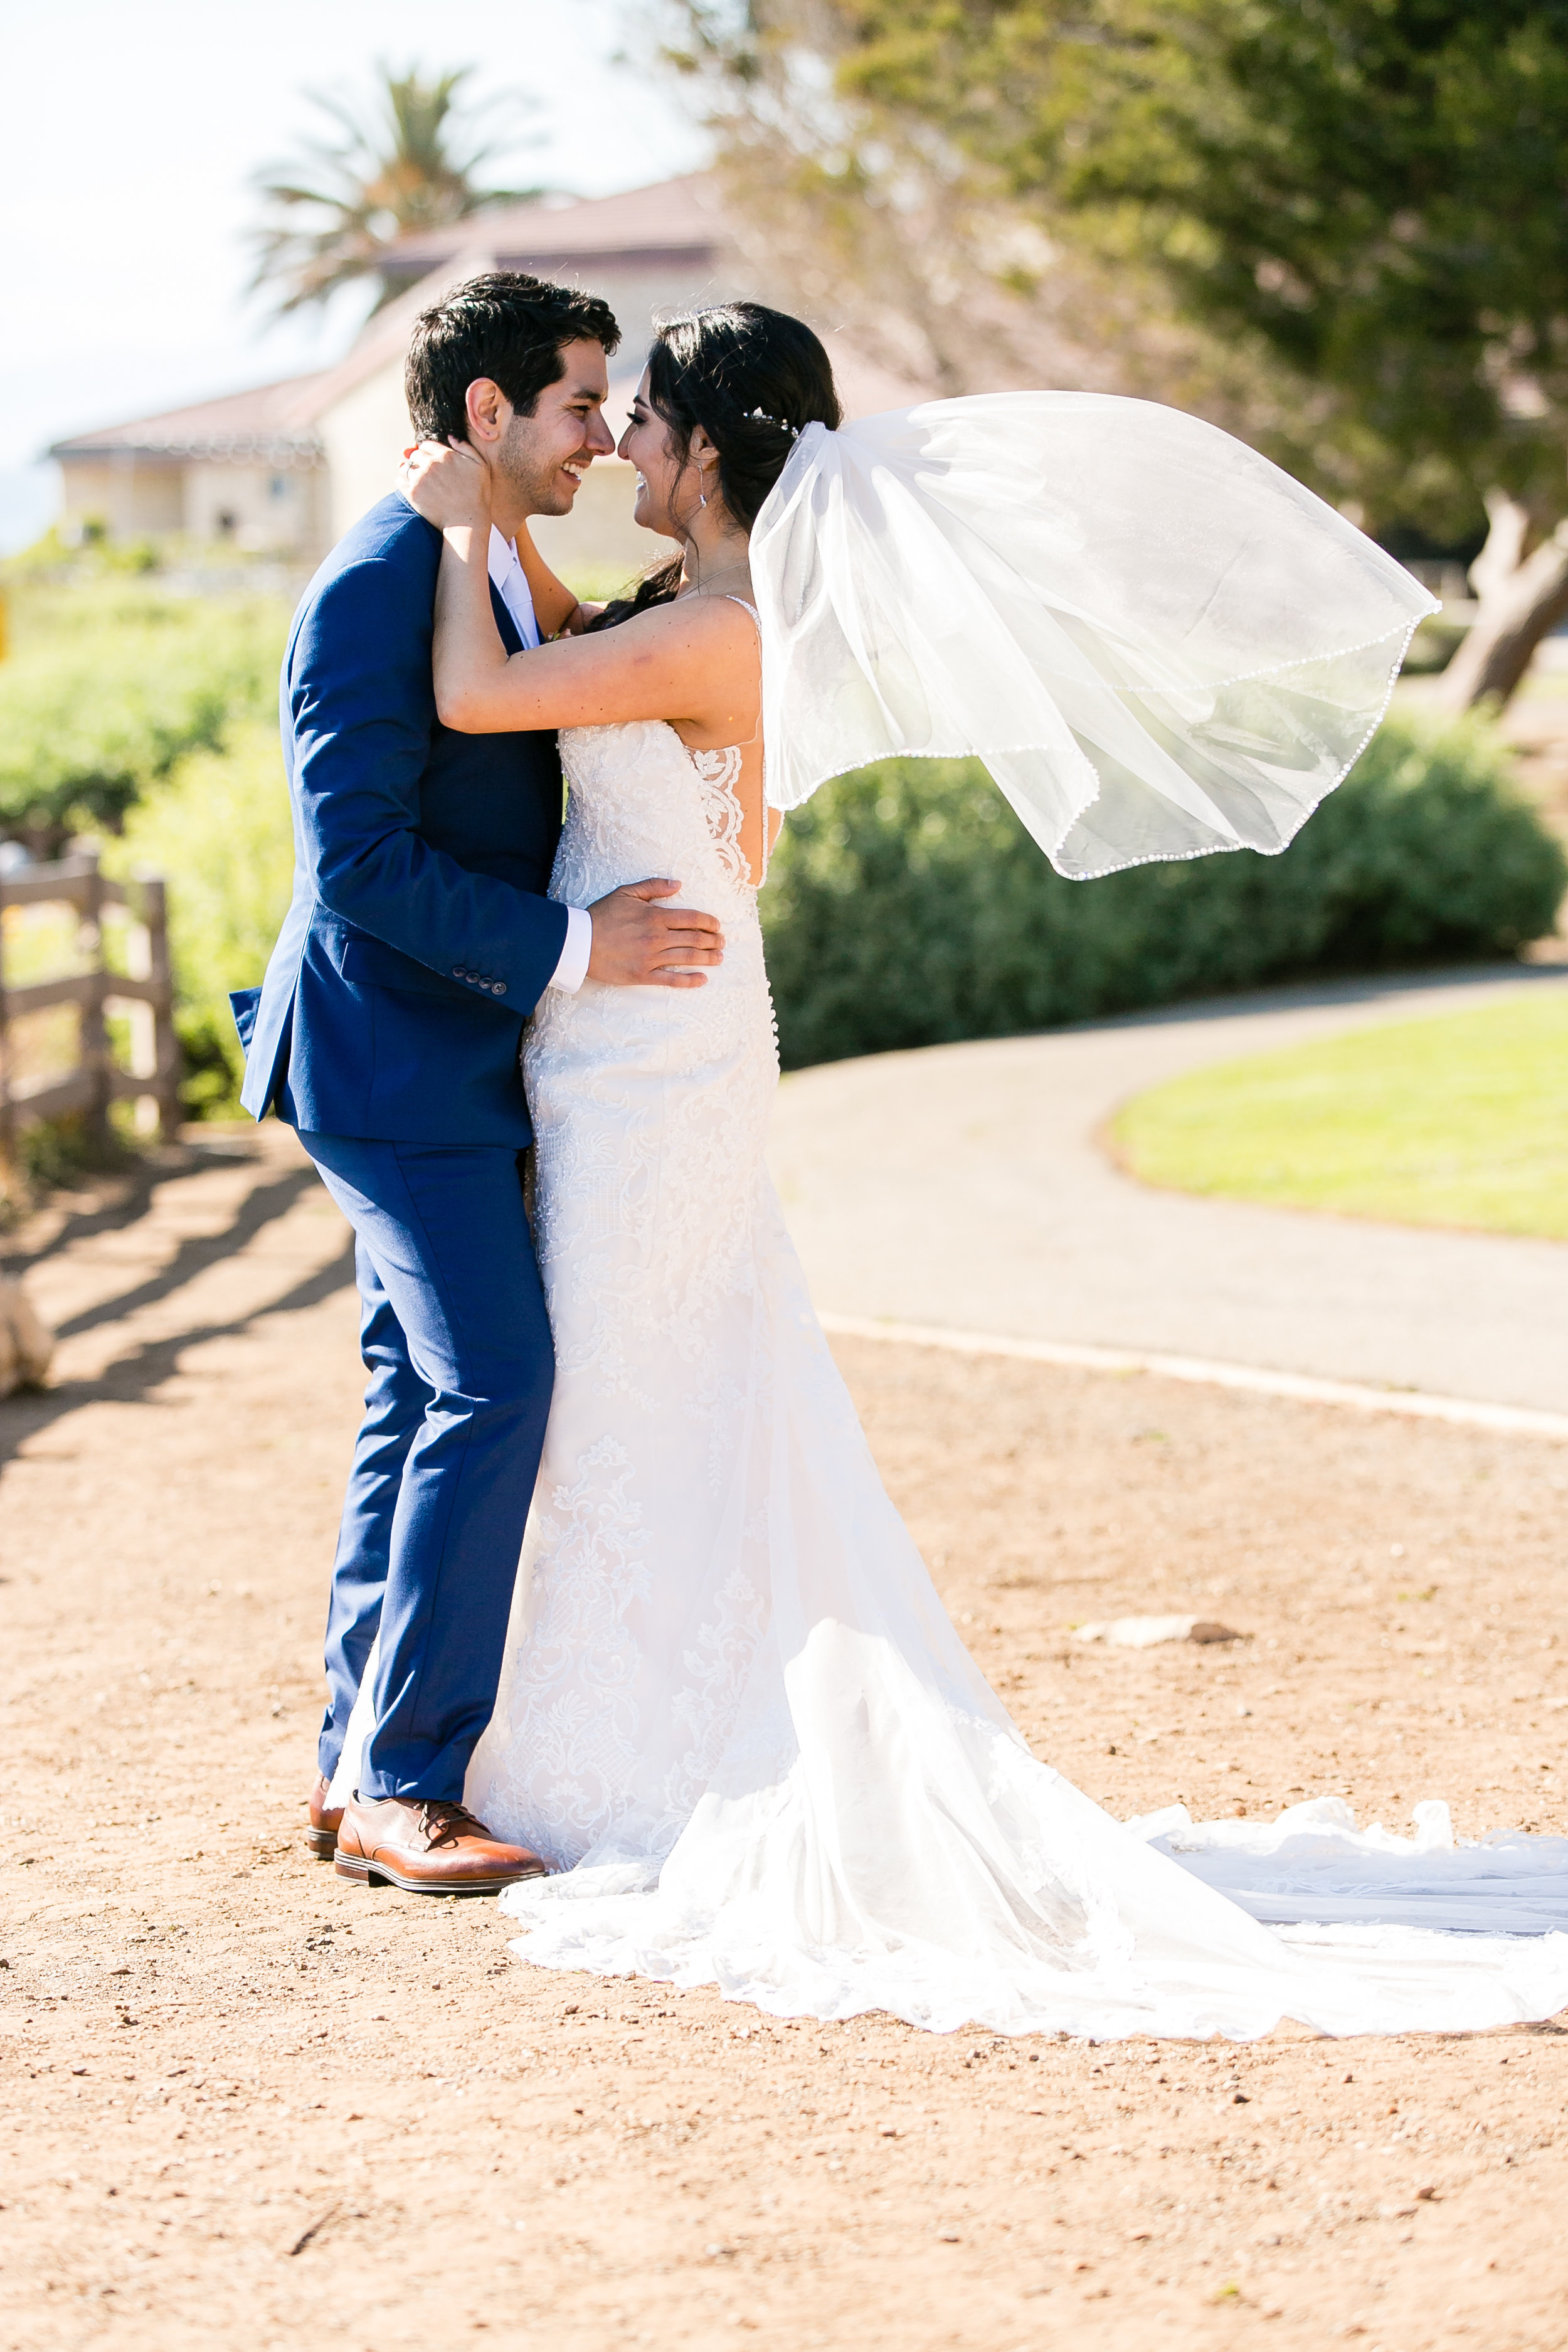 2019_05_24_Wedding_Barajas_0702.jpg